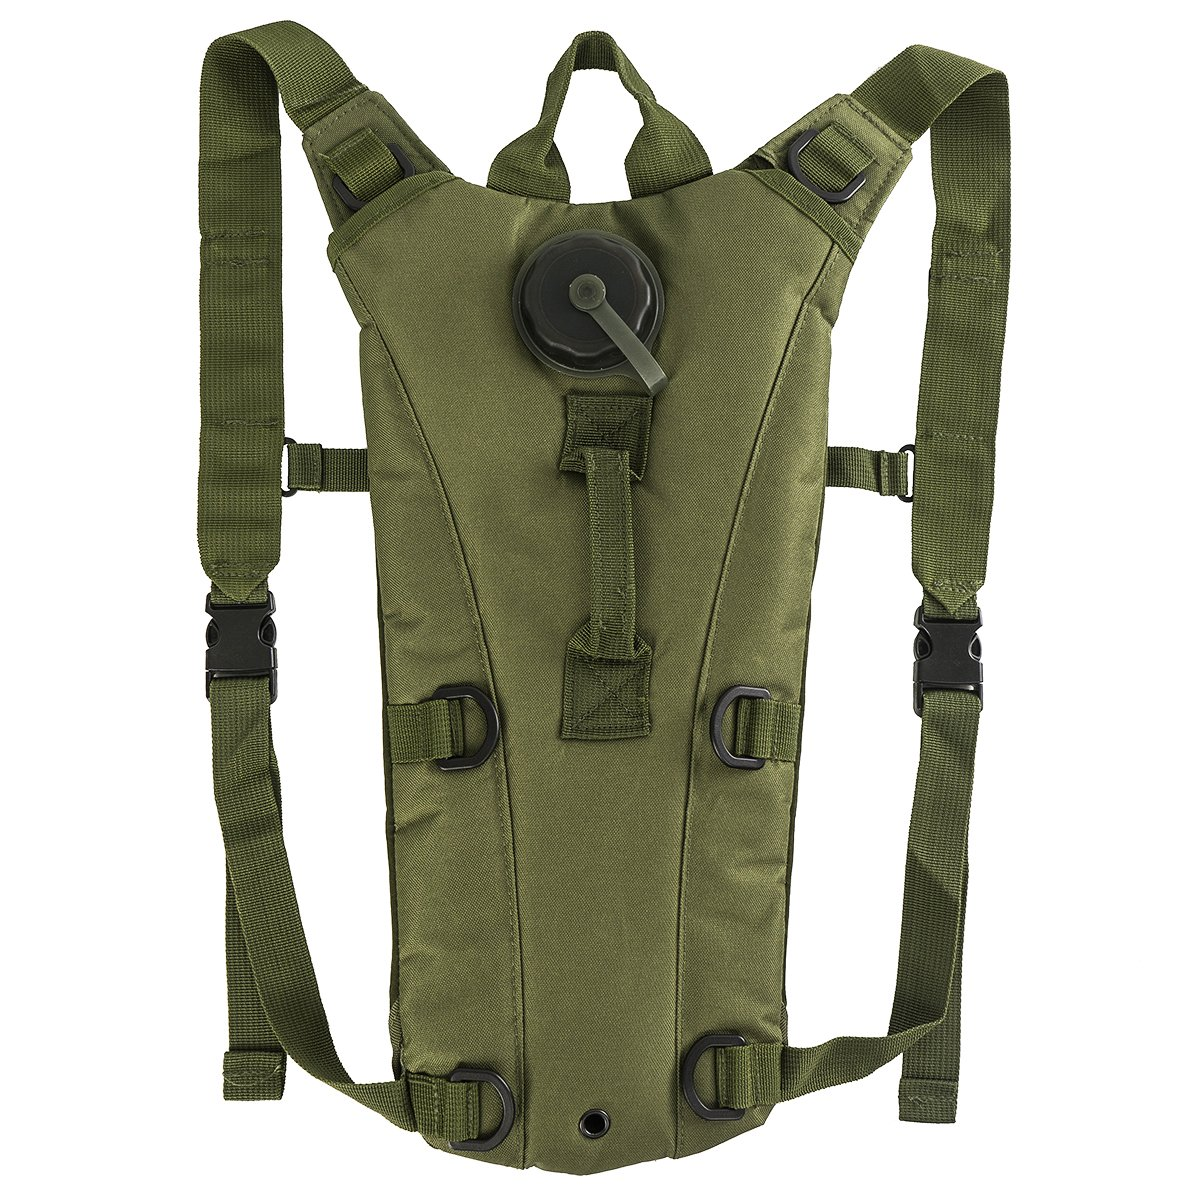 3l Tactical Hydration Pack軽量膀胱水ポーチバックパックハイキング、狩猟、サイクリング、ランニング、ウォーキングや登山  グリーン B01LWPFA1W